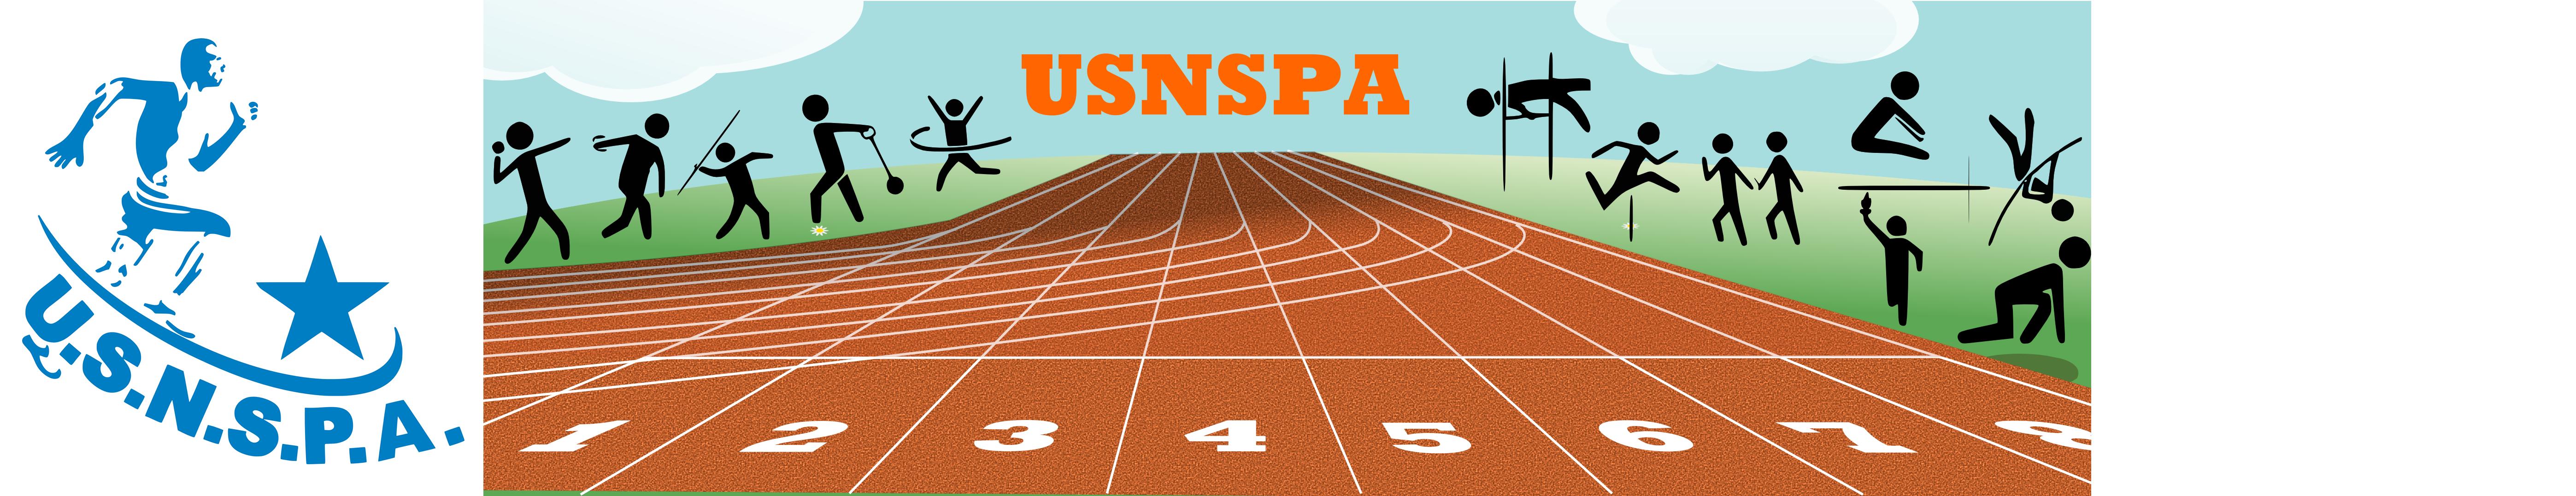 USNSPA athlétisme